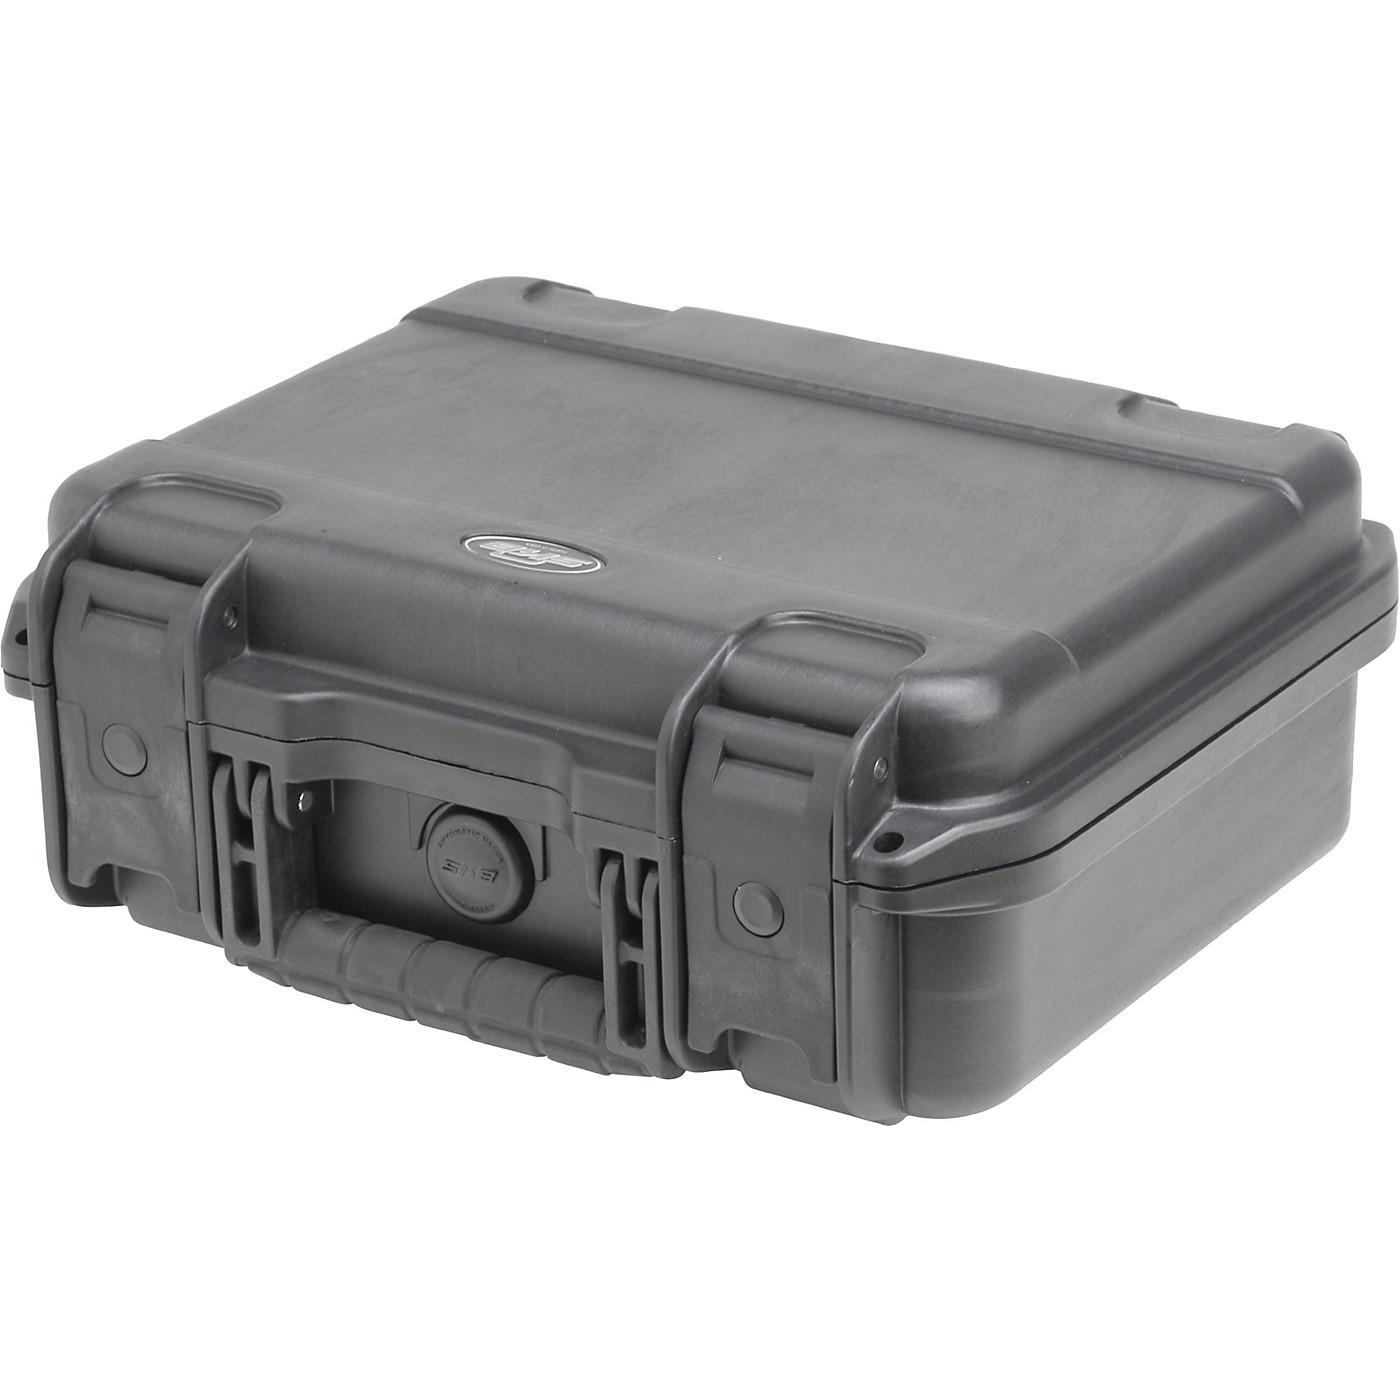 SKB 3i 1610 Equipment Case with Foam thumbnail